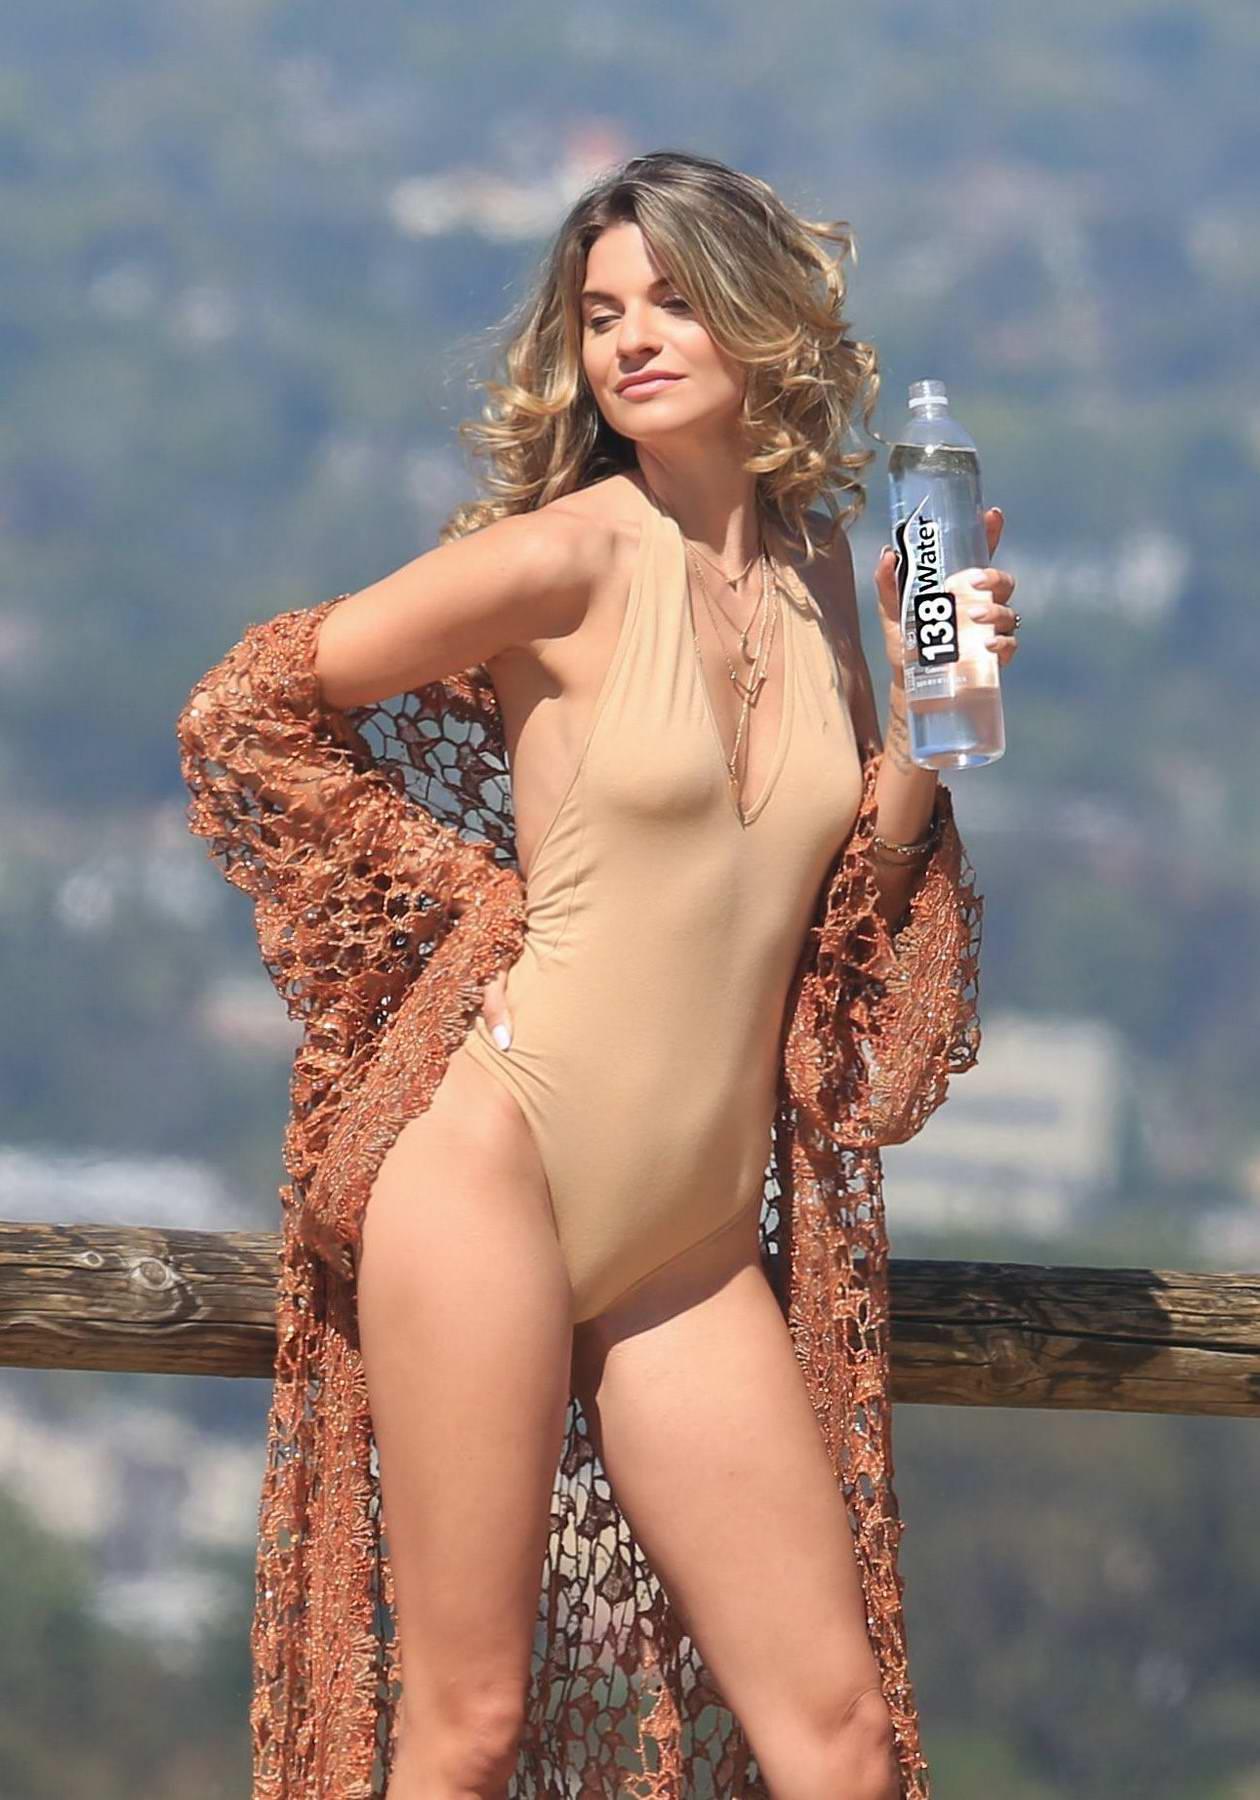 Rachel McCord nude (16 fotos), leaked Bikini, iCloud, lingerie 2017